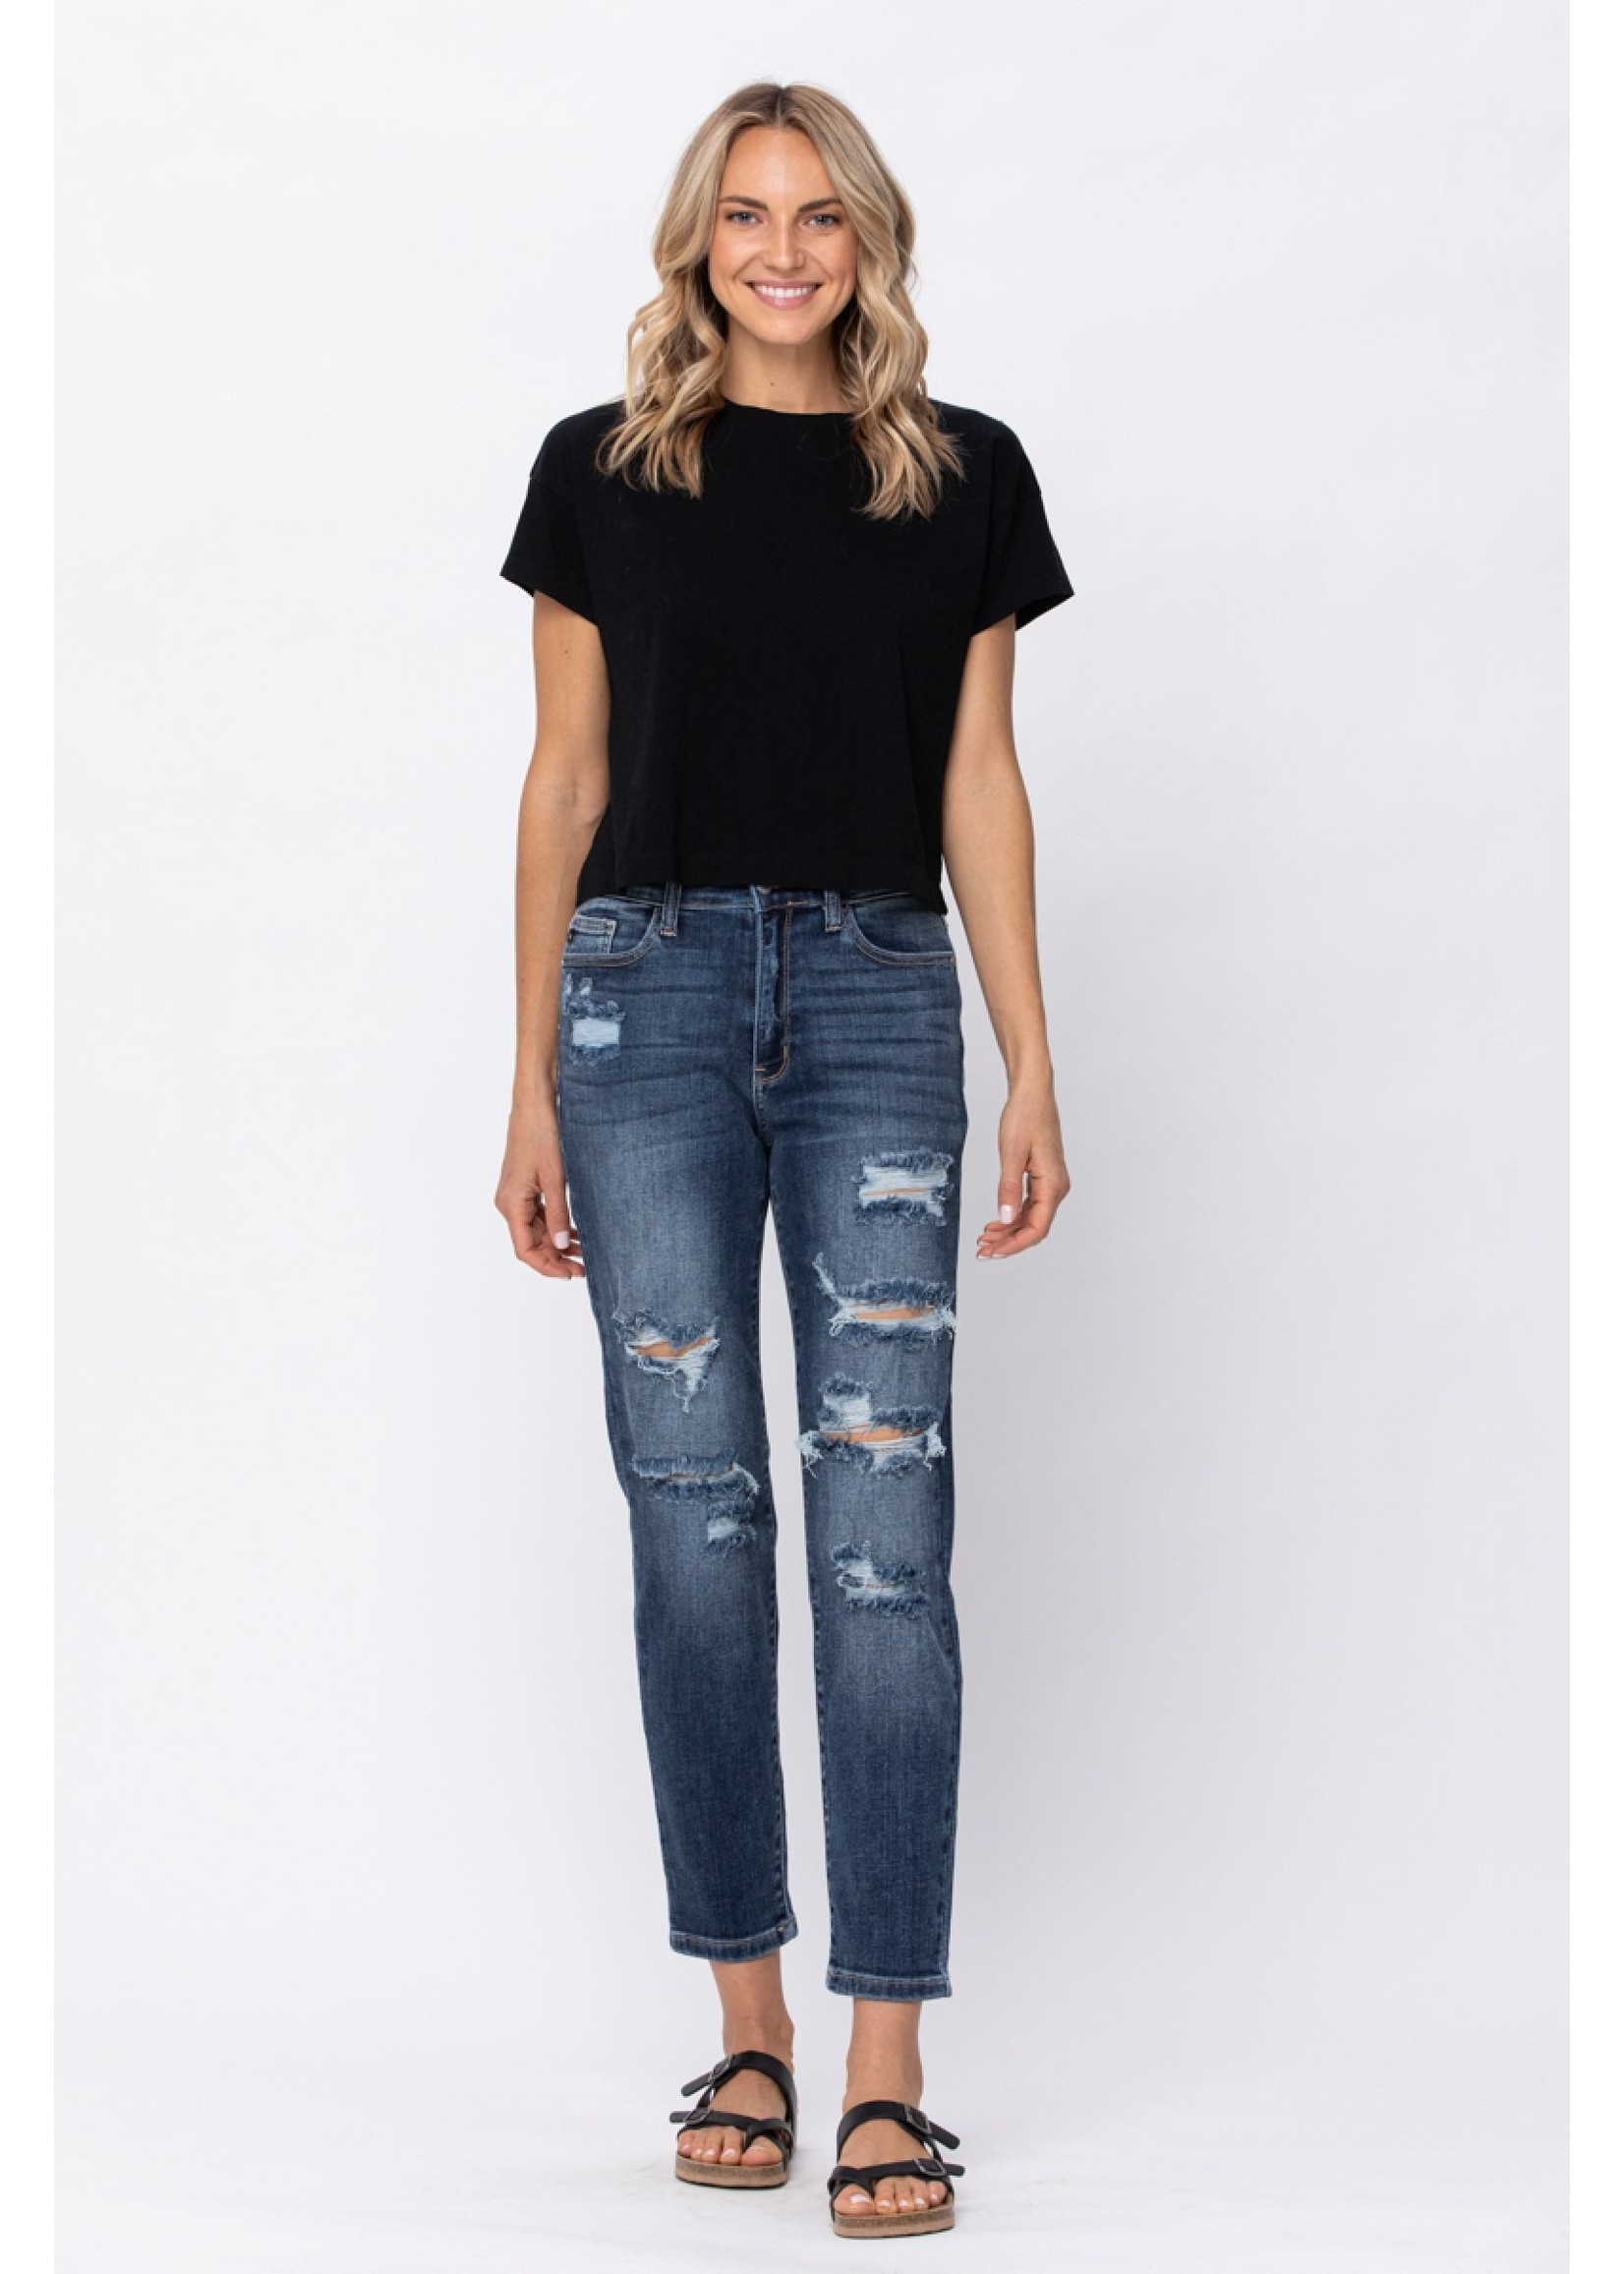 Judy Blue High Rise Distressed Boyfriend Jeans